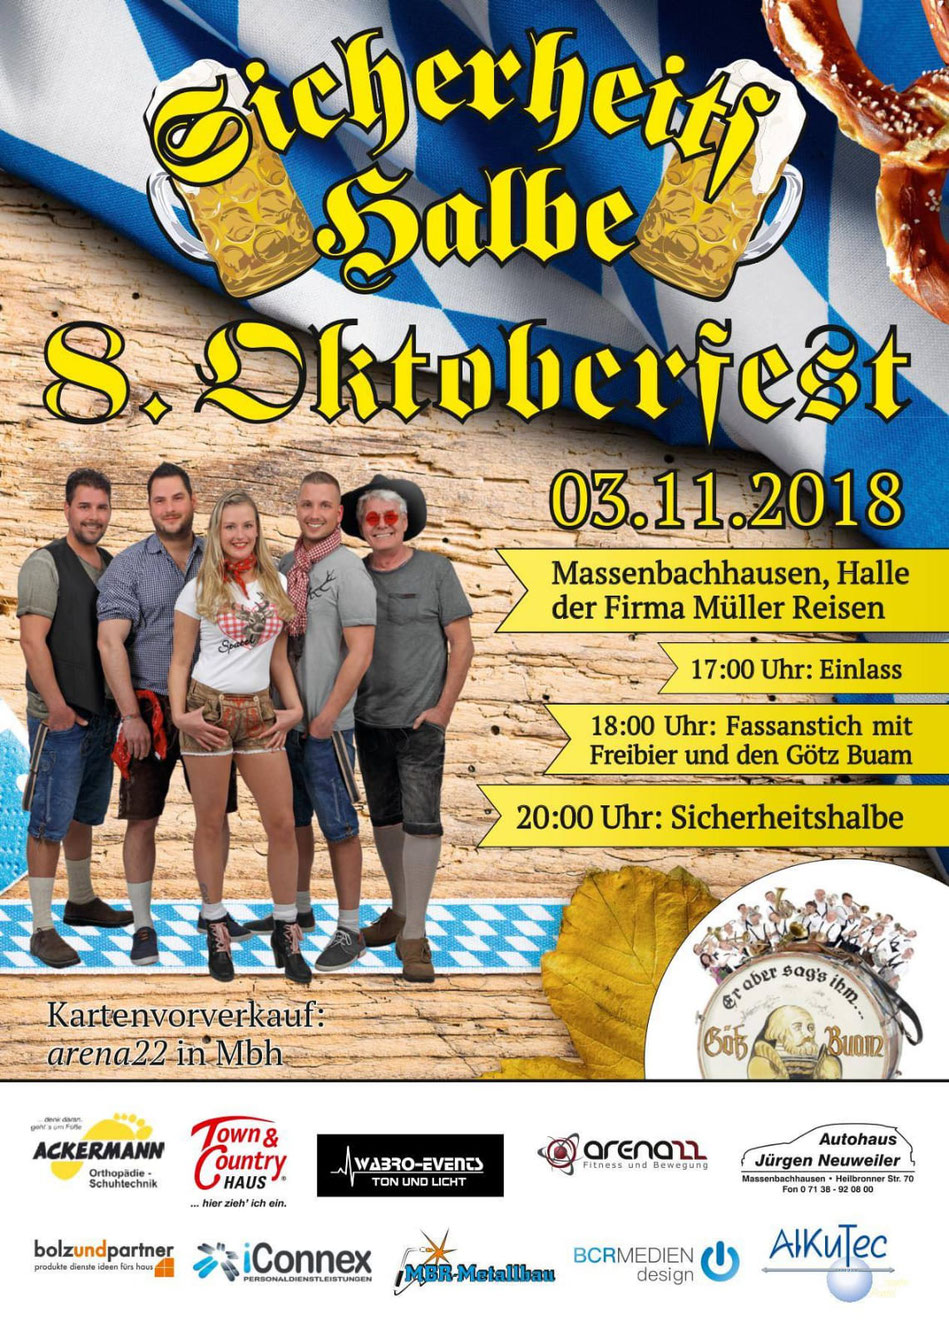 Veranstaltung Party Cover Band Oktoberfest in Massenbachhausen am 03.11.2018, Halle der Firma Müller Reisen, Special Guest Götz Buam